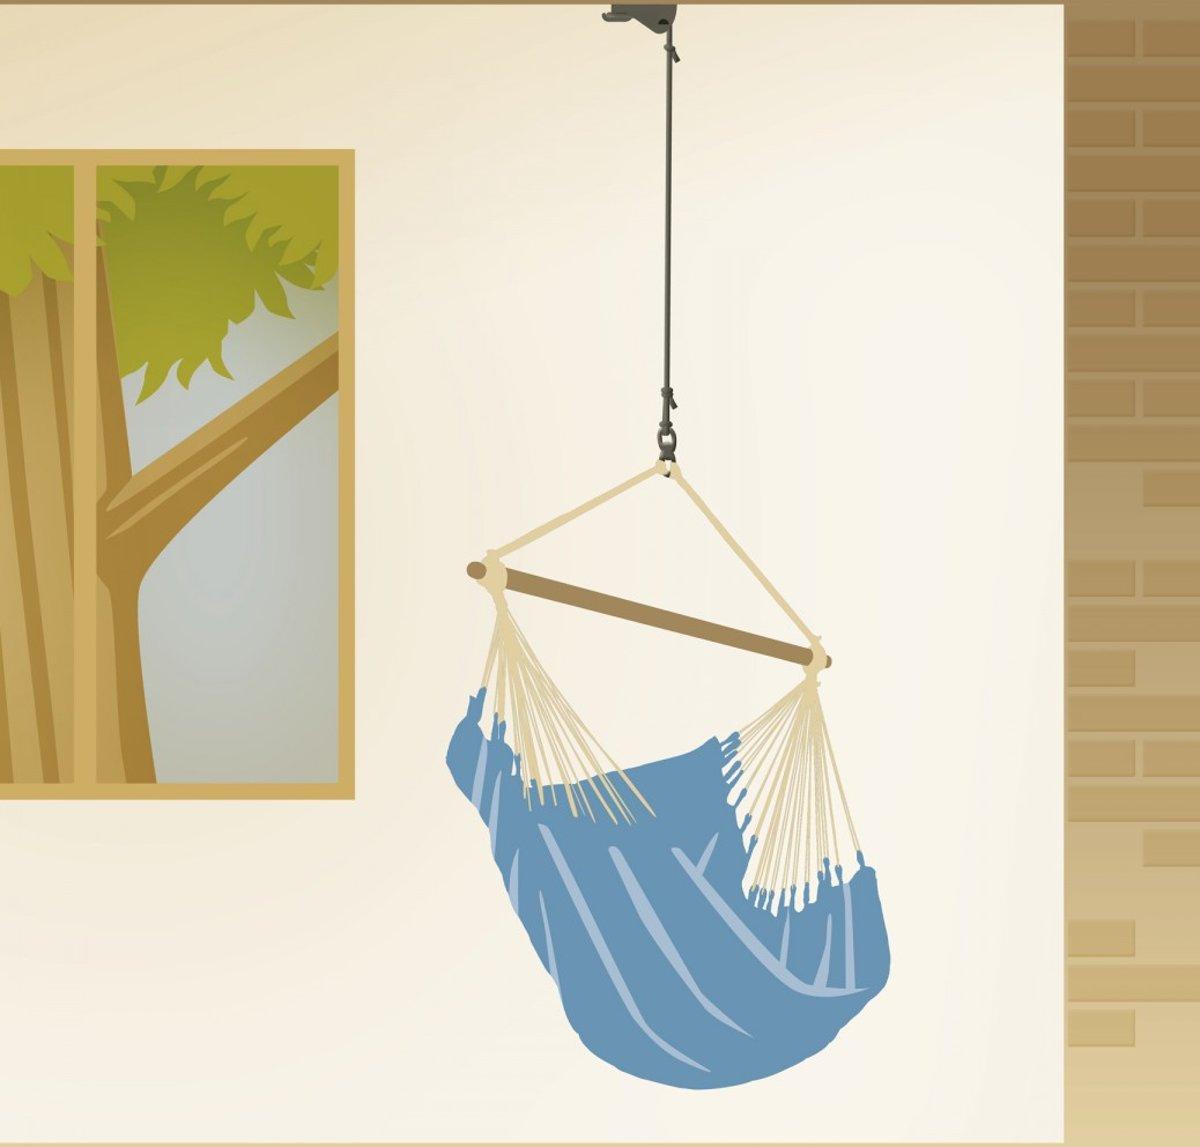 Hangmat Ophangen Plafond.Bol Com La Siesta Bevestigingsset Hangstoel Home Rope